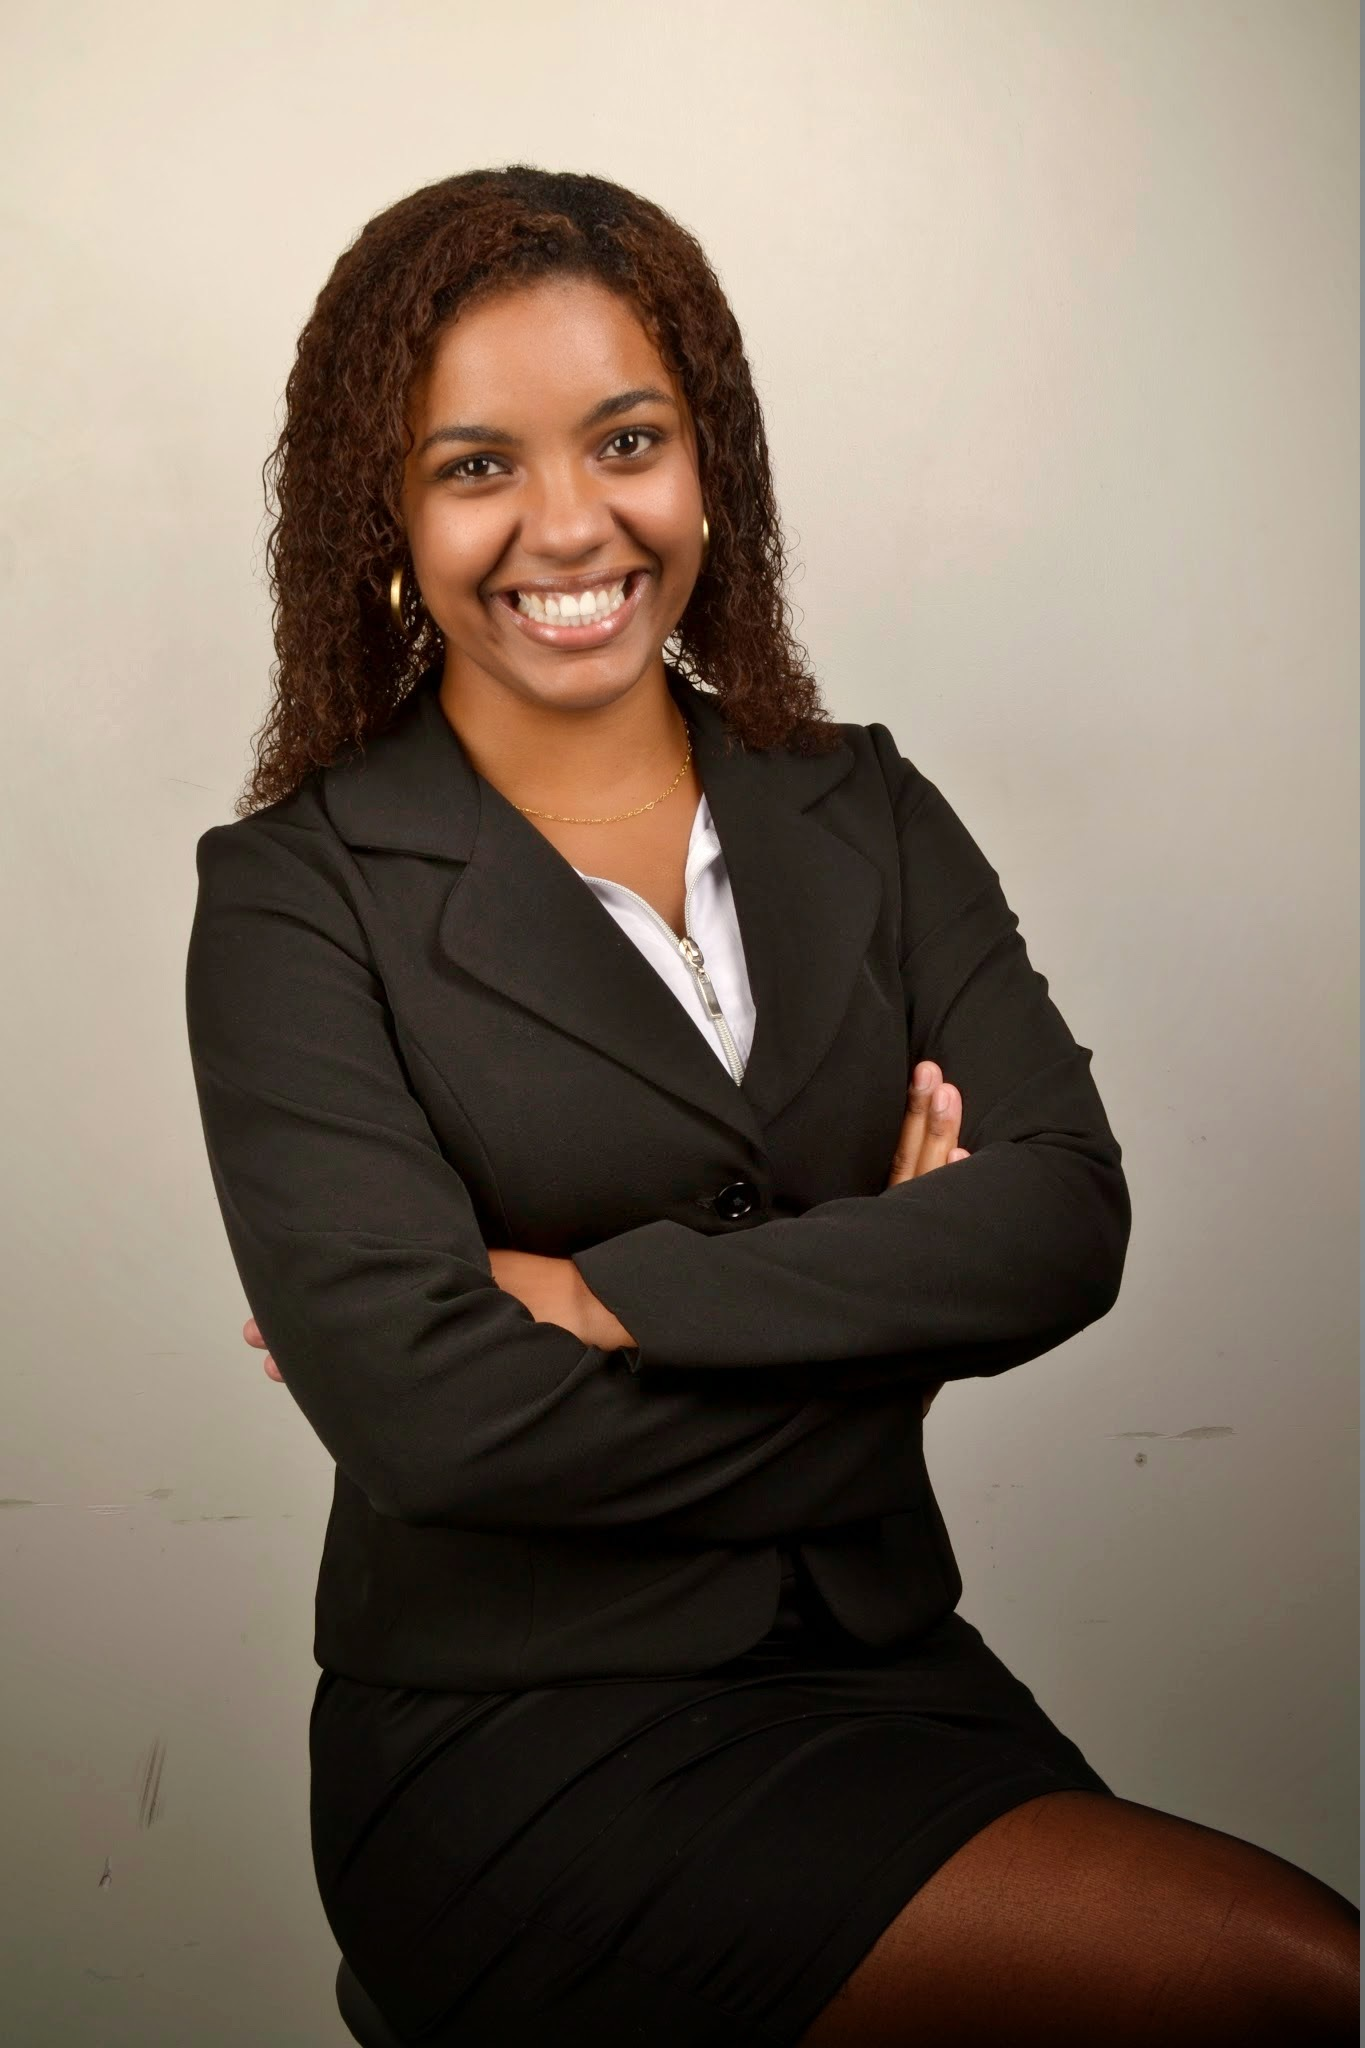 rhonda-young-black-professional